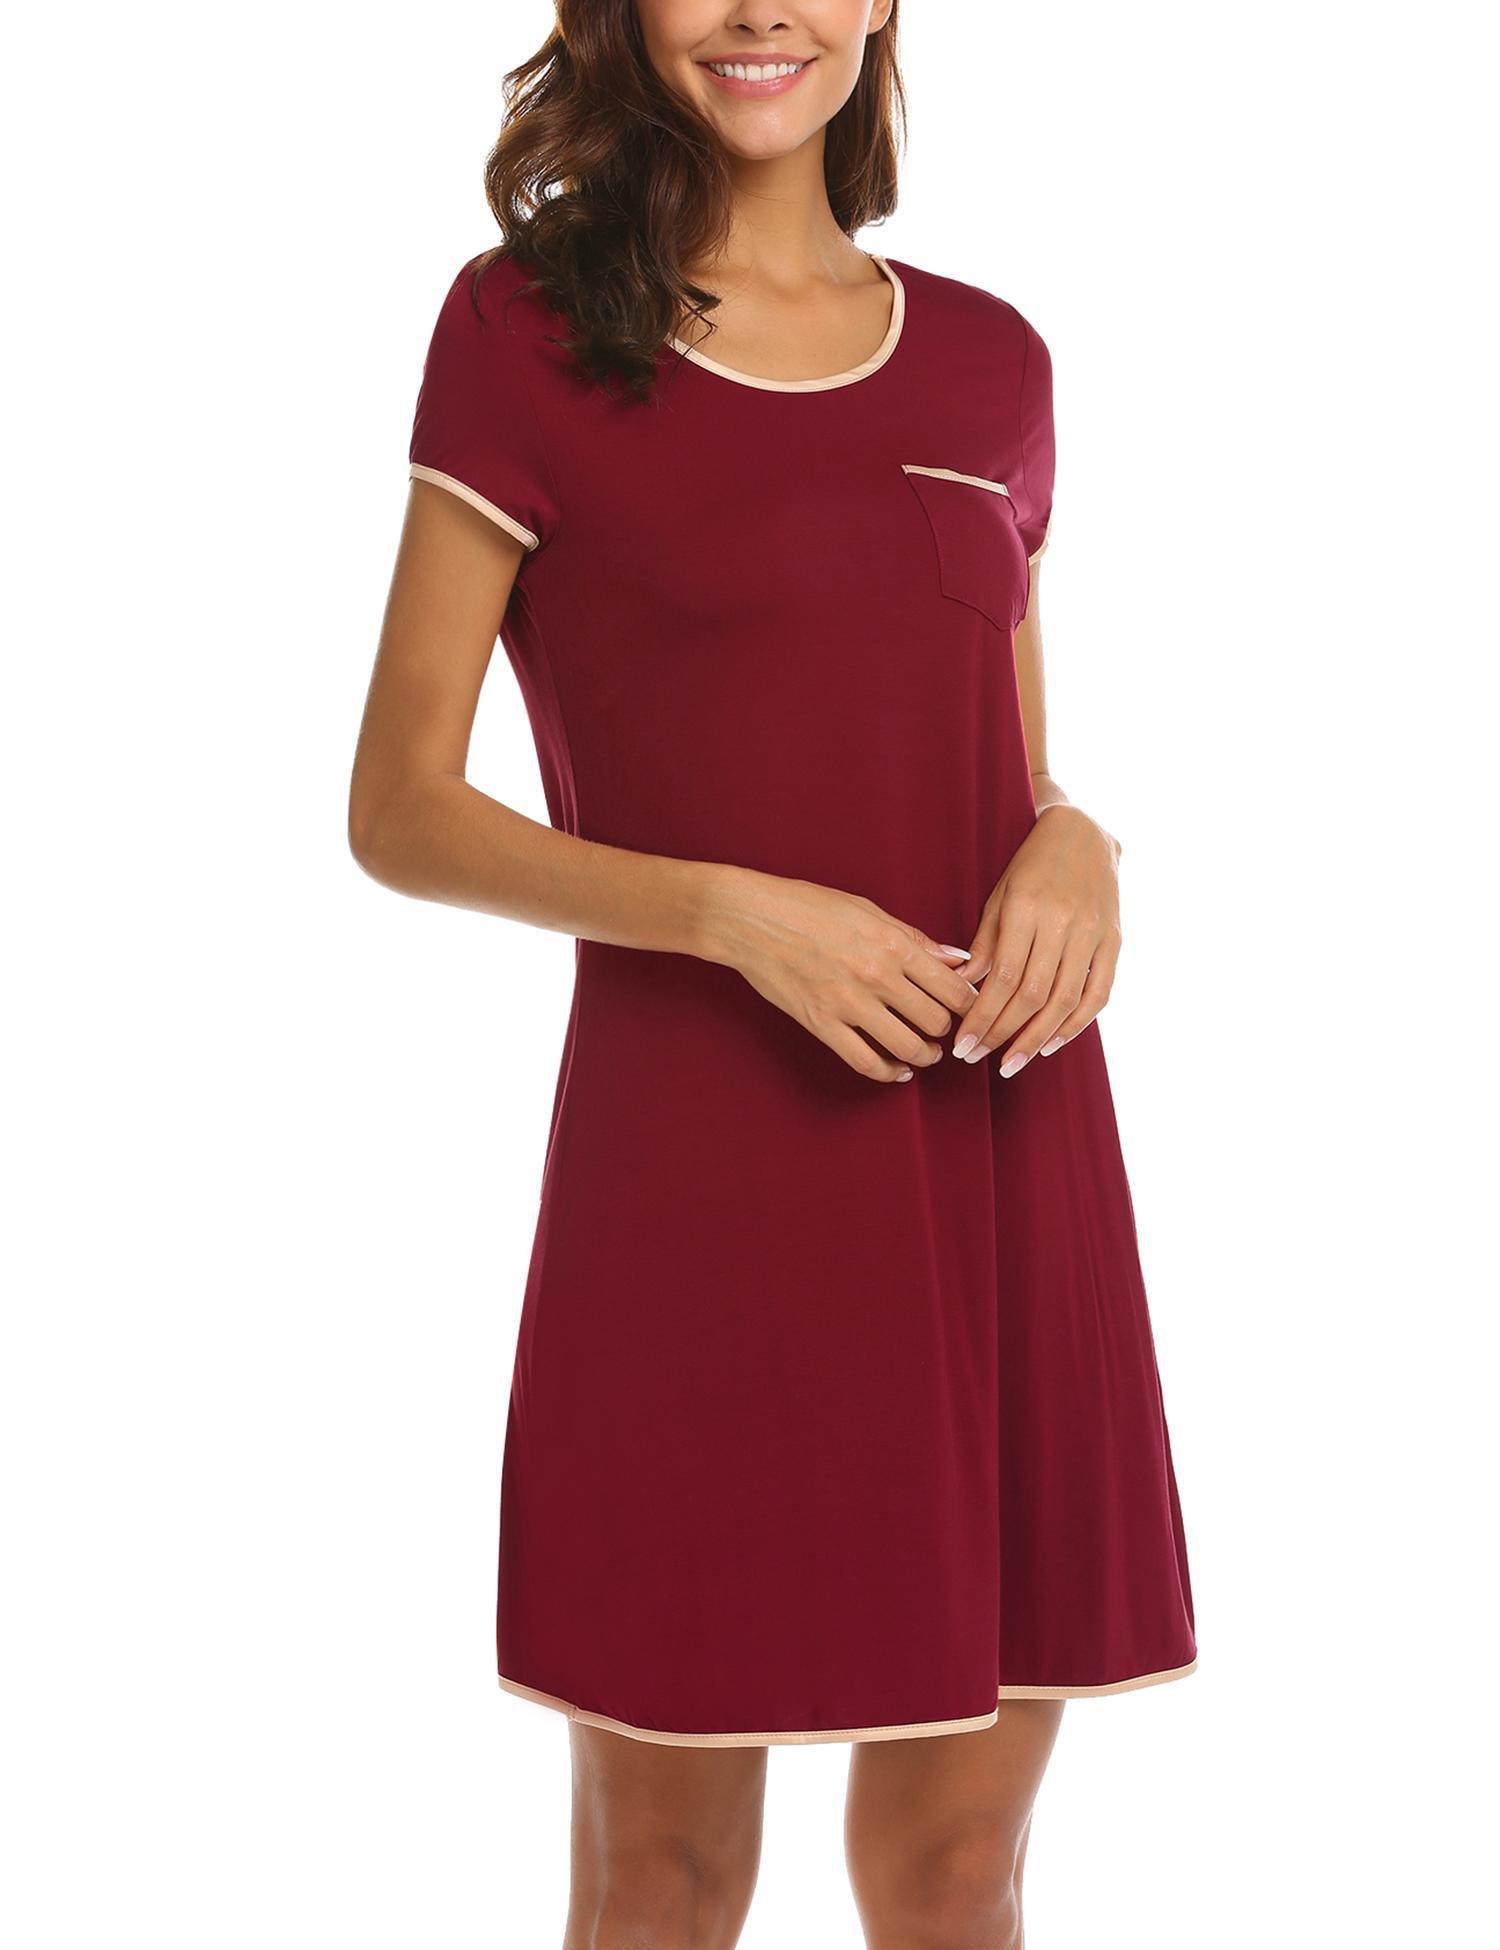 Ekouaer Nightshirts for Women Plus Size Scoop Neck Sleep Tee Nightshirt (Wine Red XL)